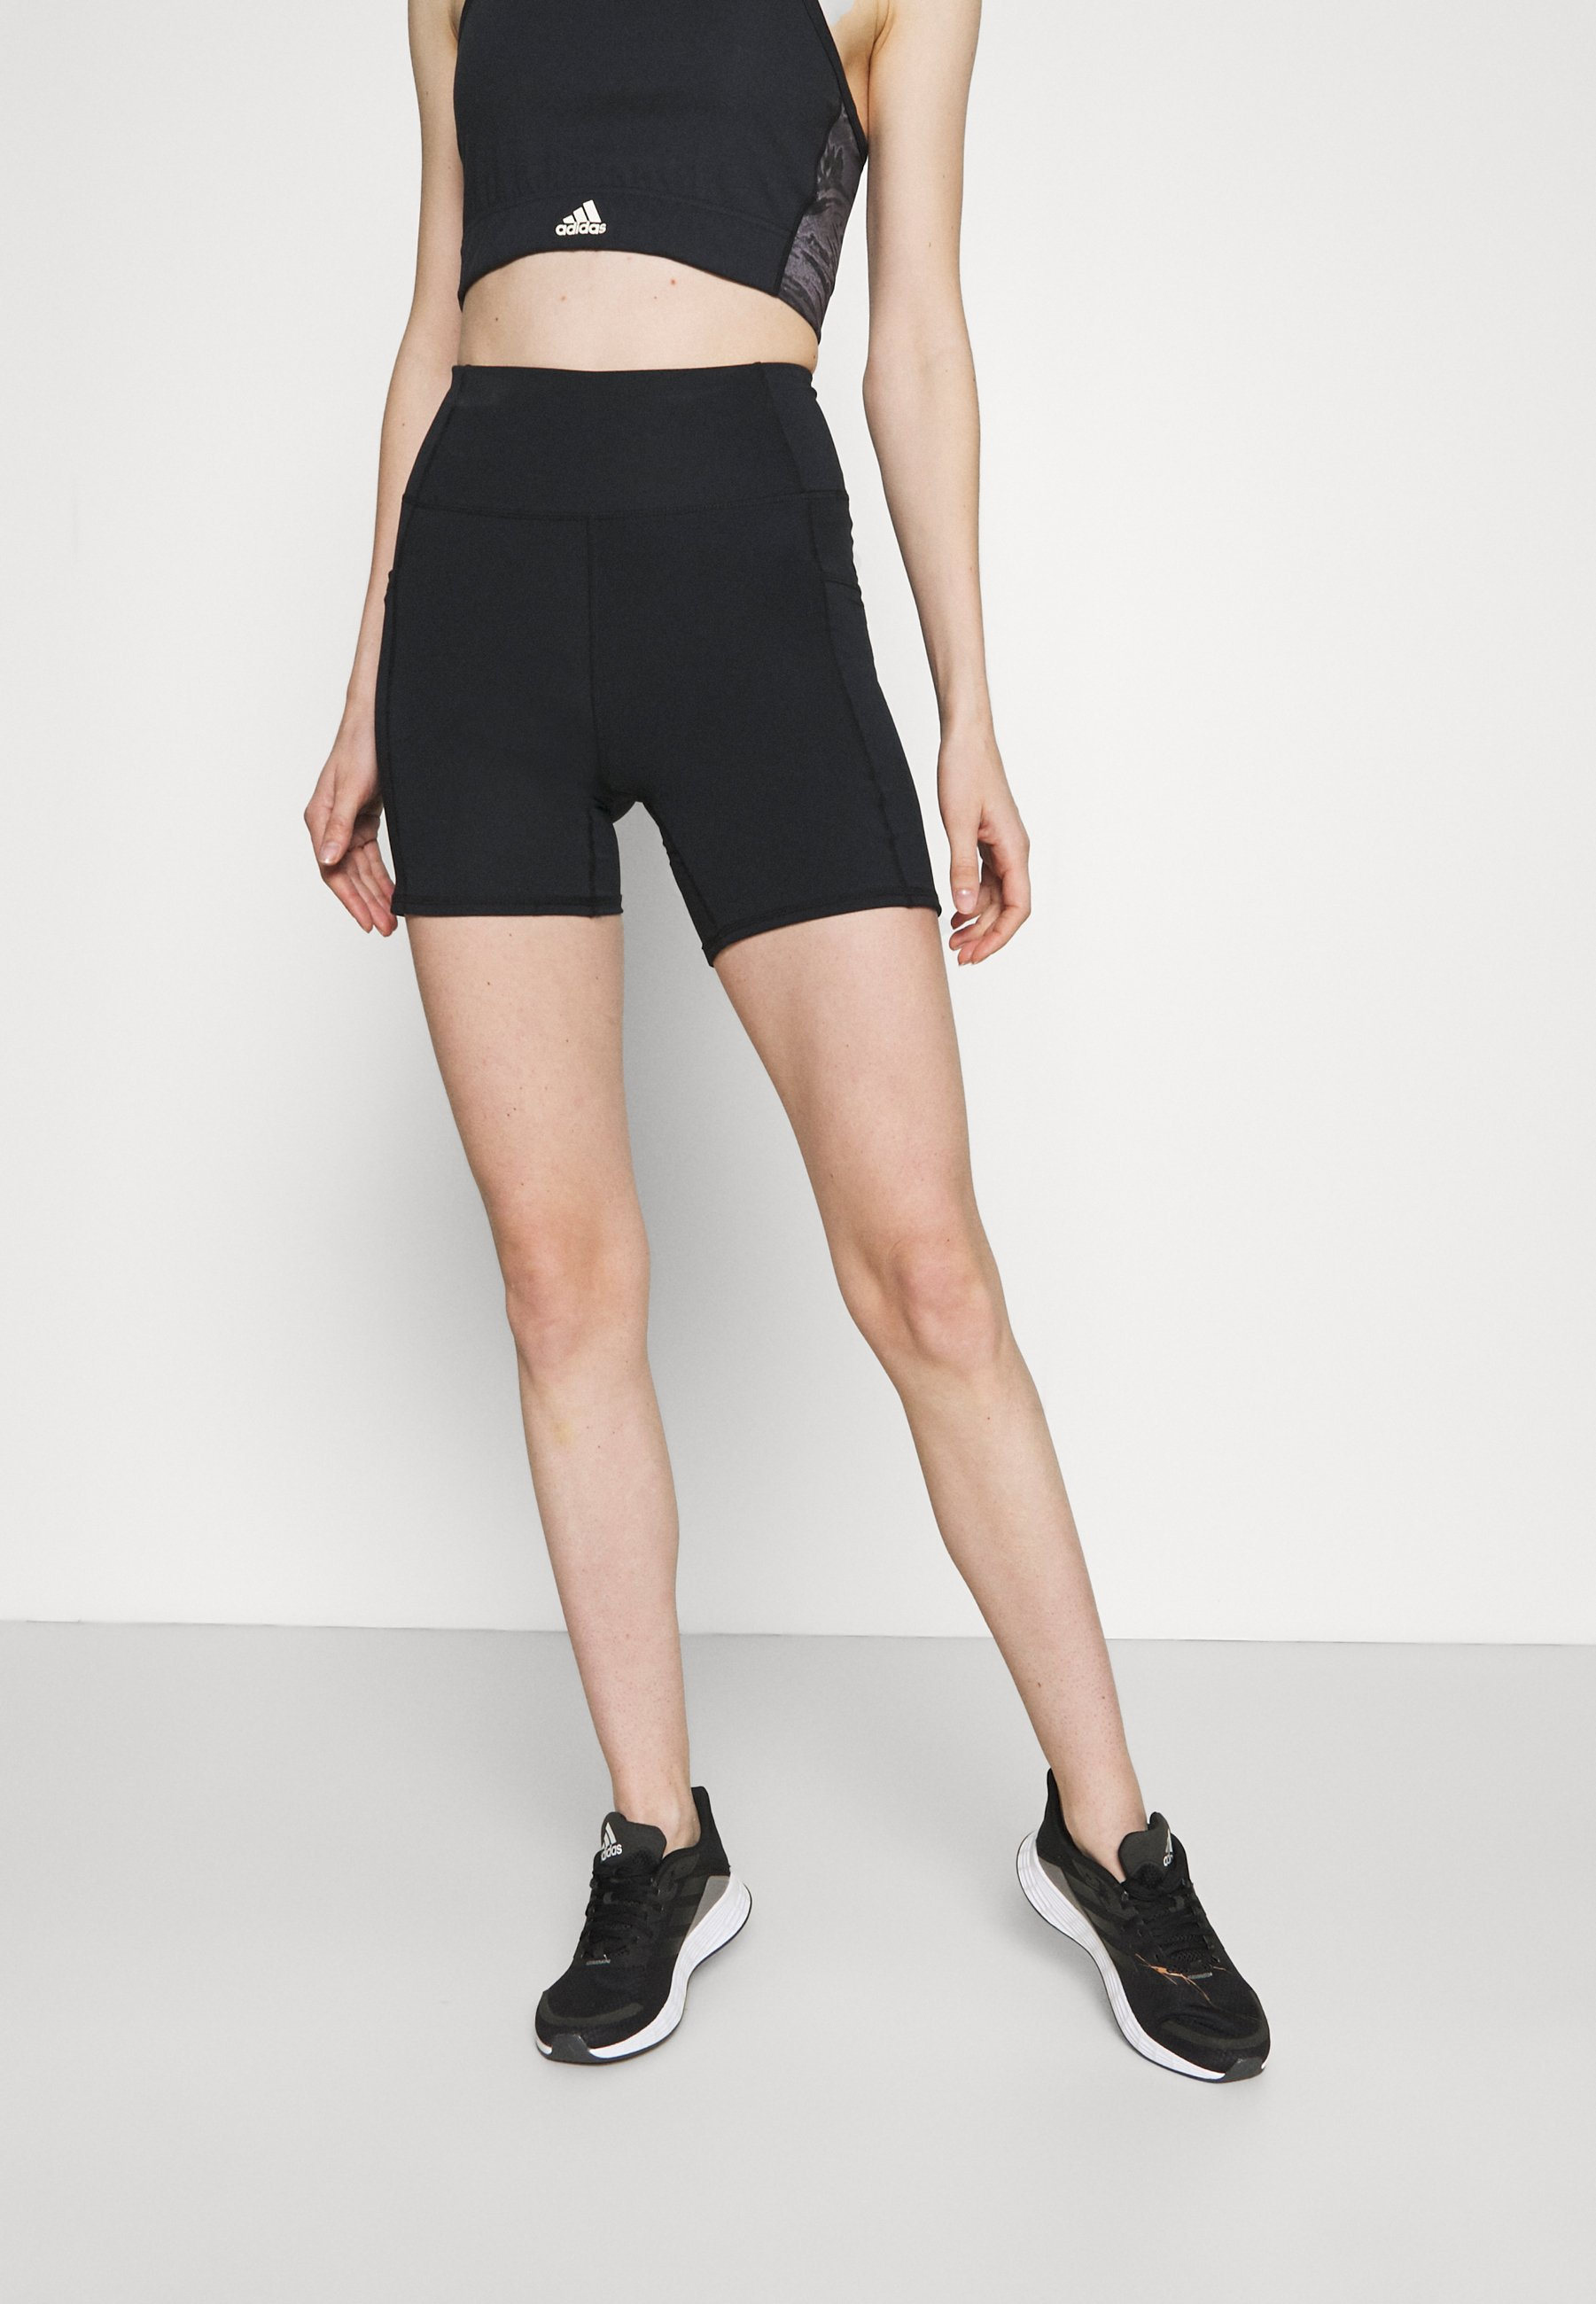 Femme LIFESTYLE POCKET BIKE SHORT - Collants